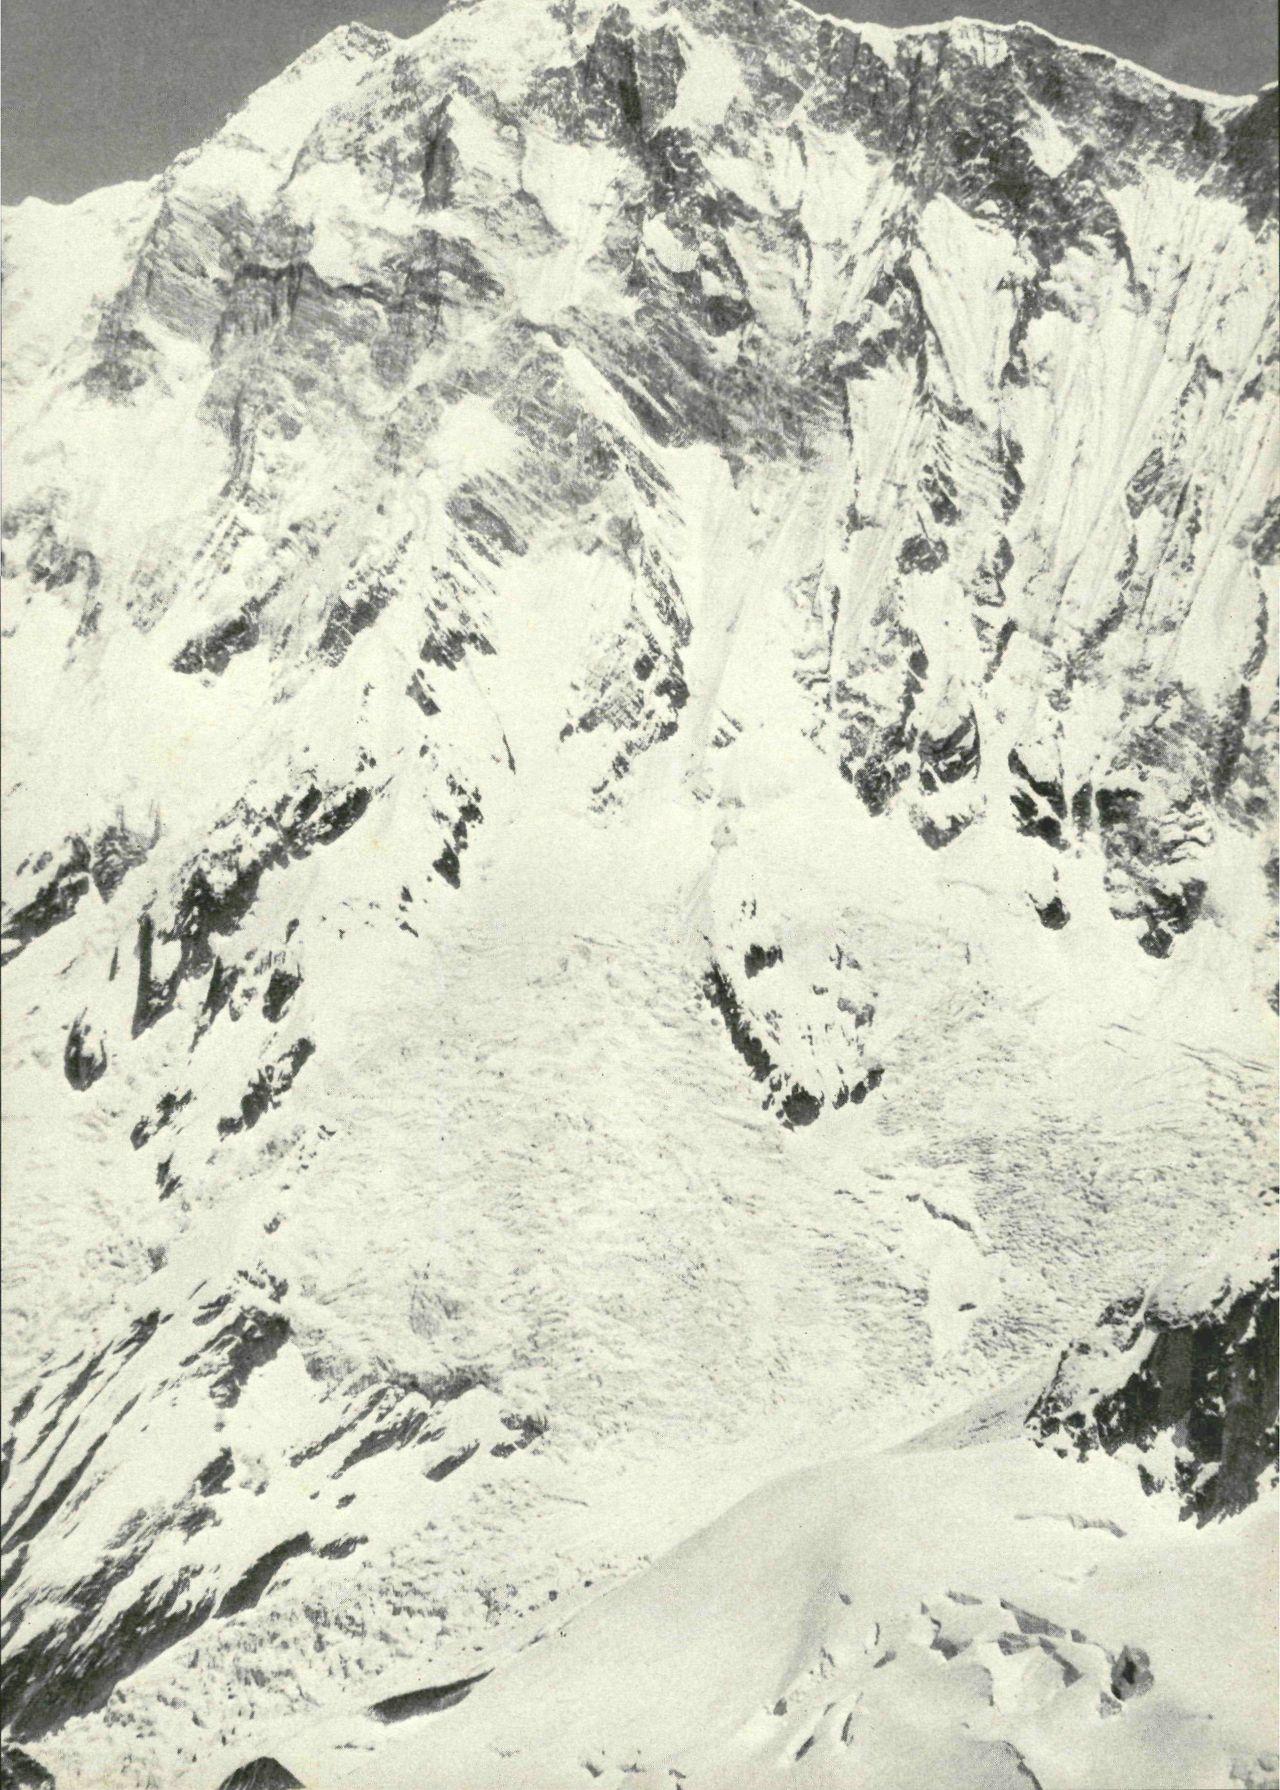 Himalaya Berge Karte.Himalaya Chronik 1969 Die Alpen Schweizer Alpen Club Sac